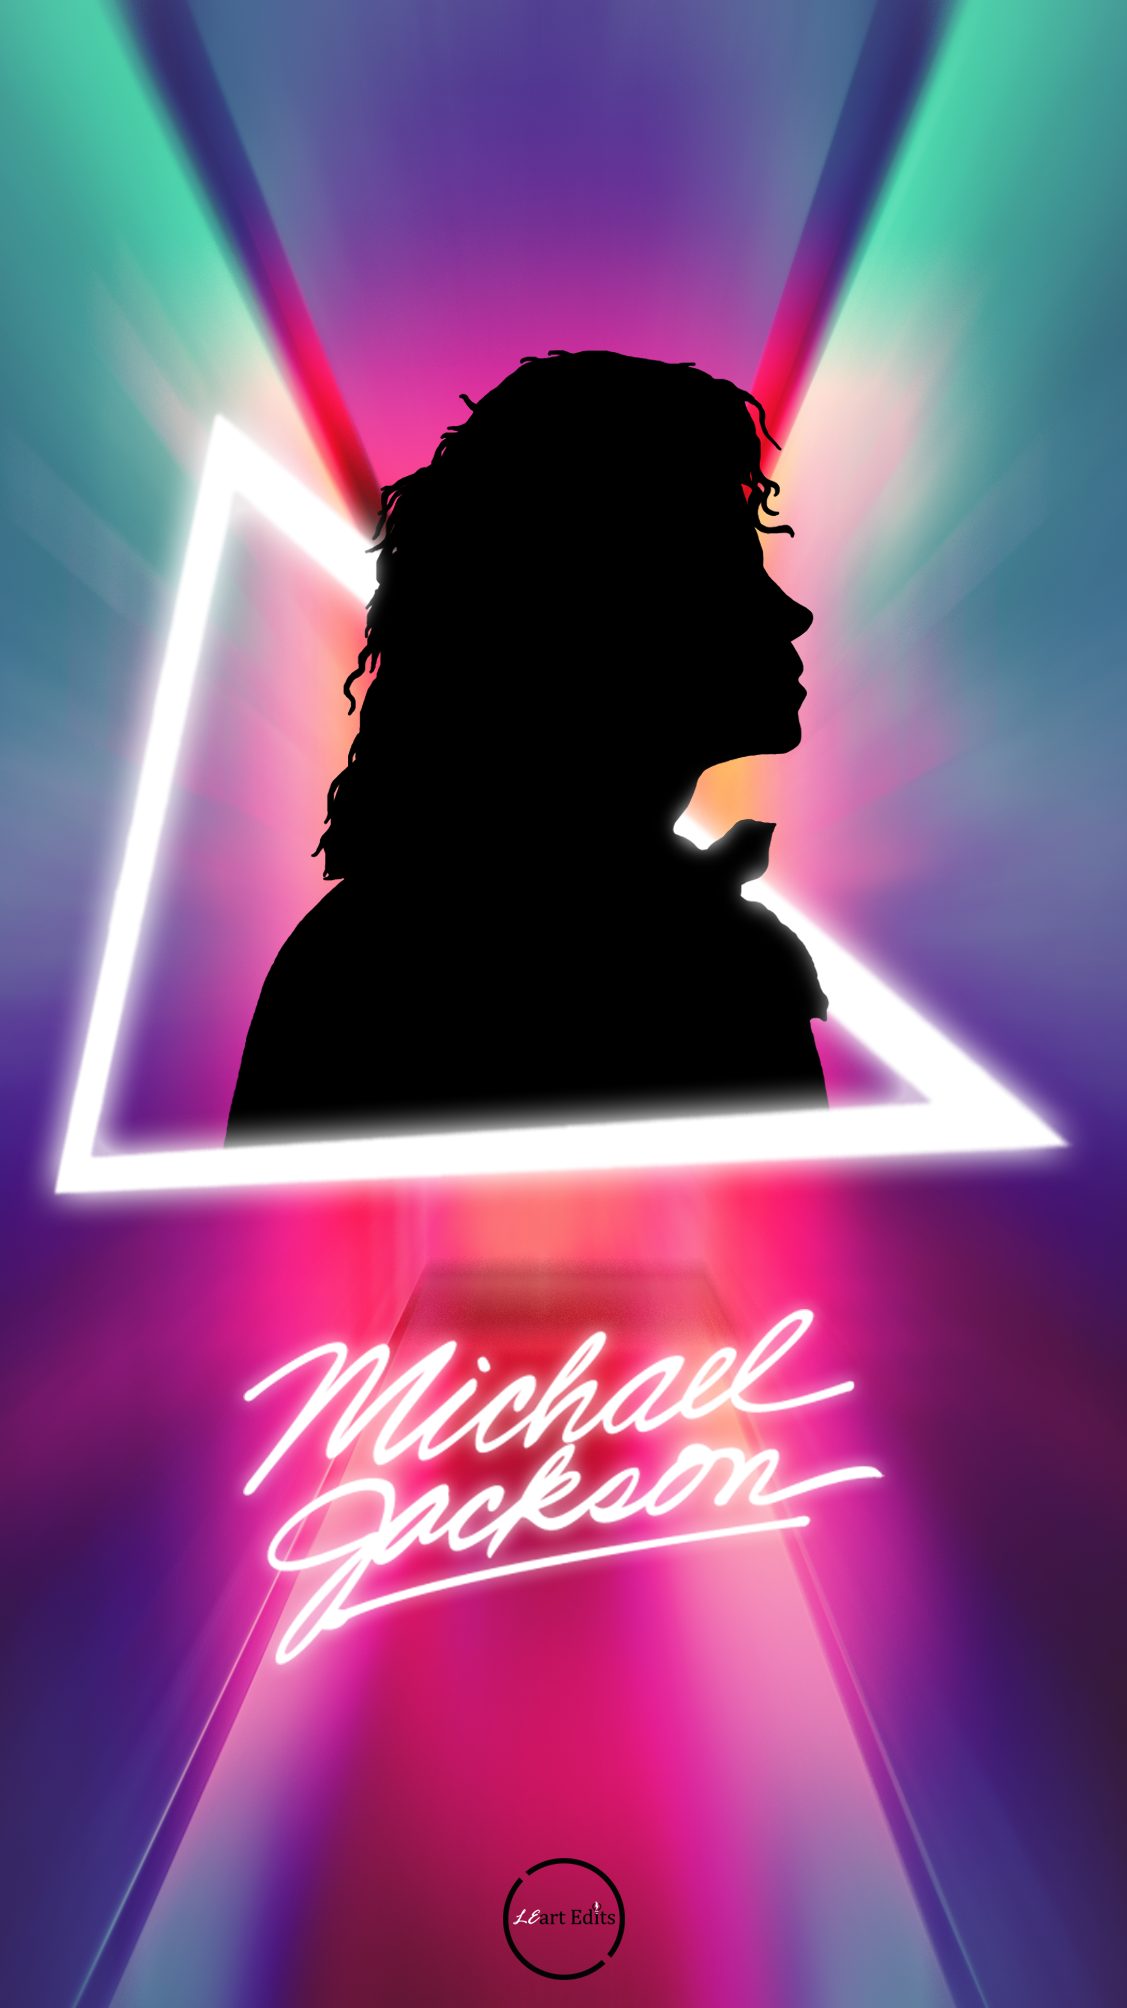 Wallpaper Of Michael Jackson King Of Pop Photoshop Art